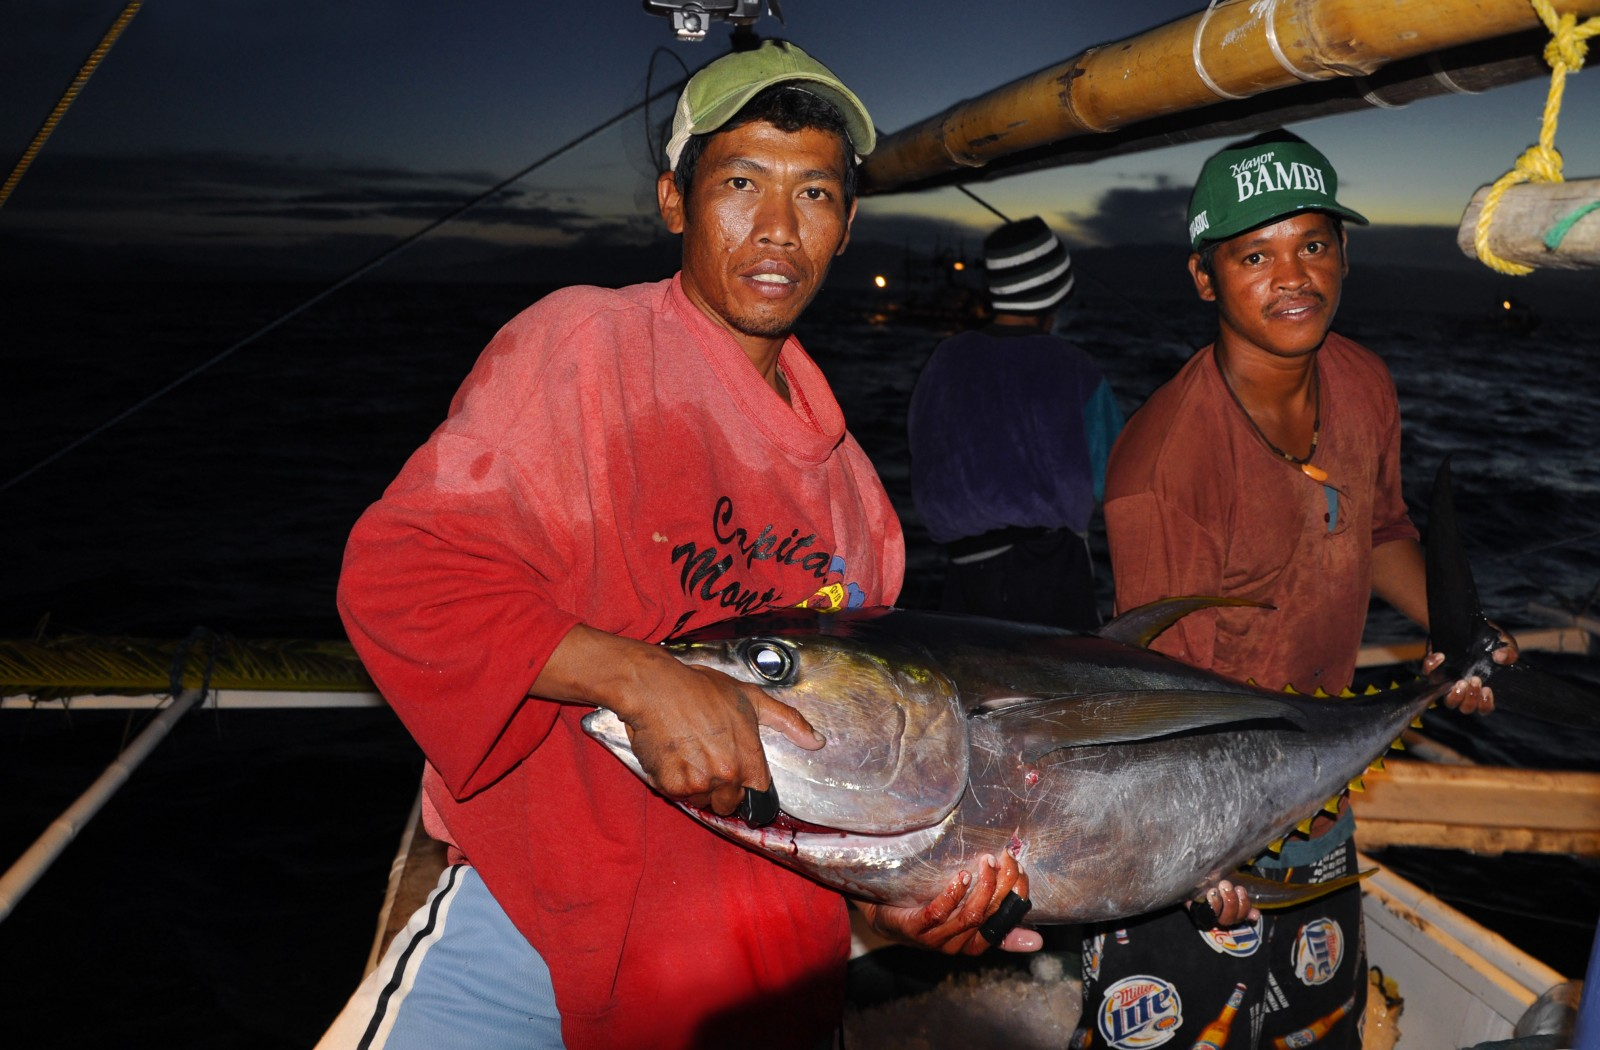 tuna-story-main-image-by-gregg-yan-for-wwf.jpg